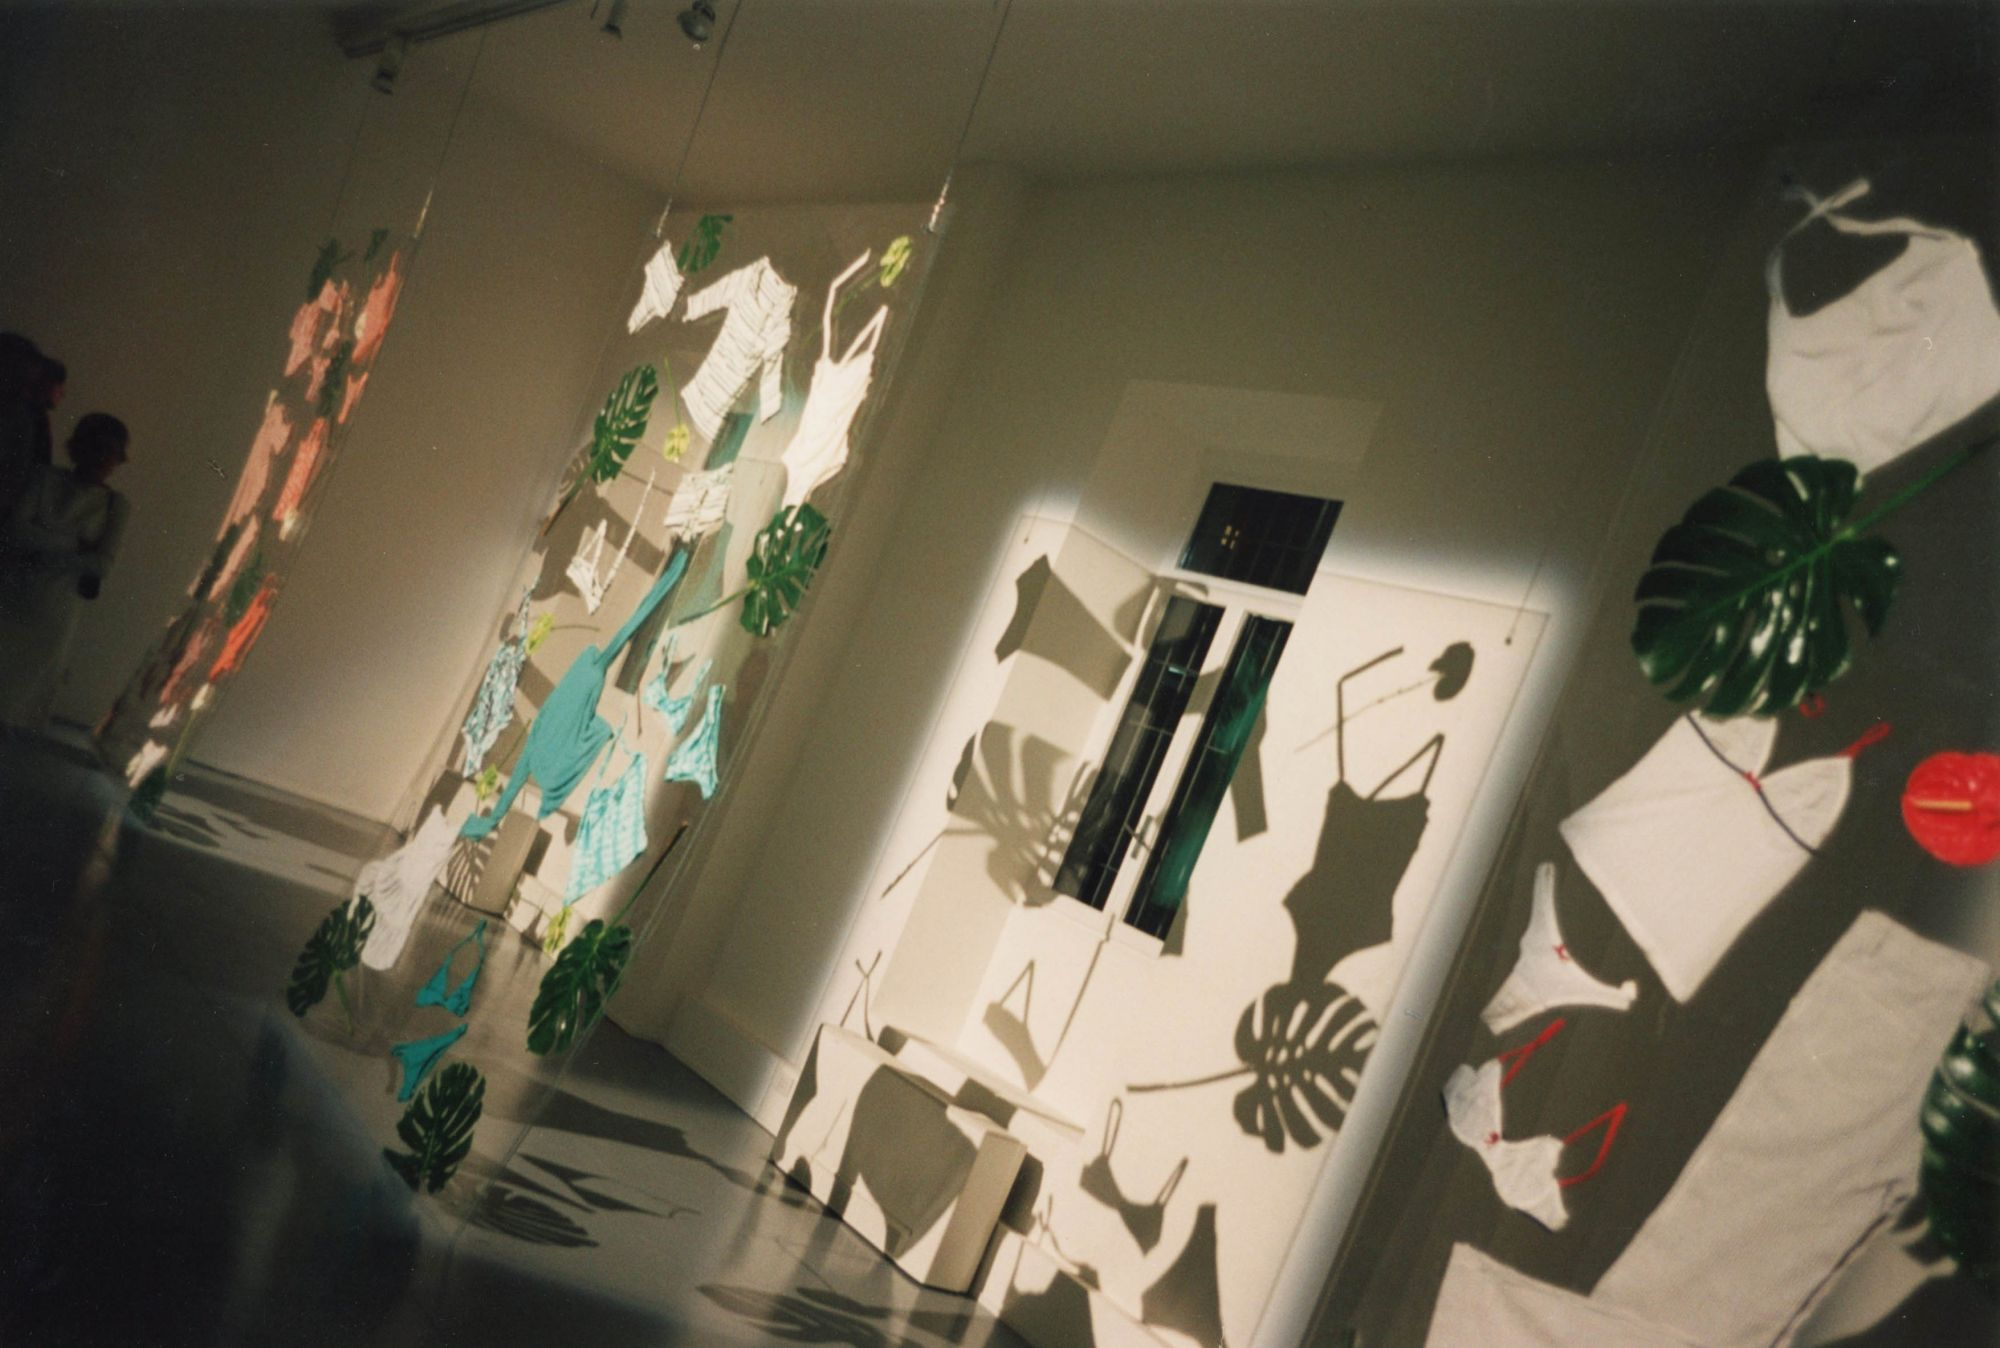 2003 Installation by Nicola Pellegrini